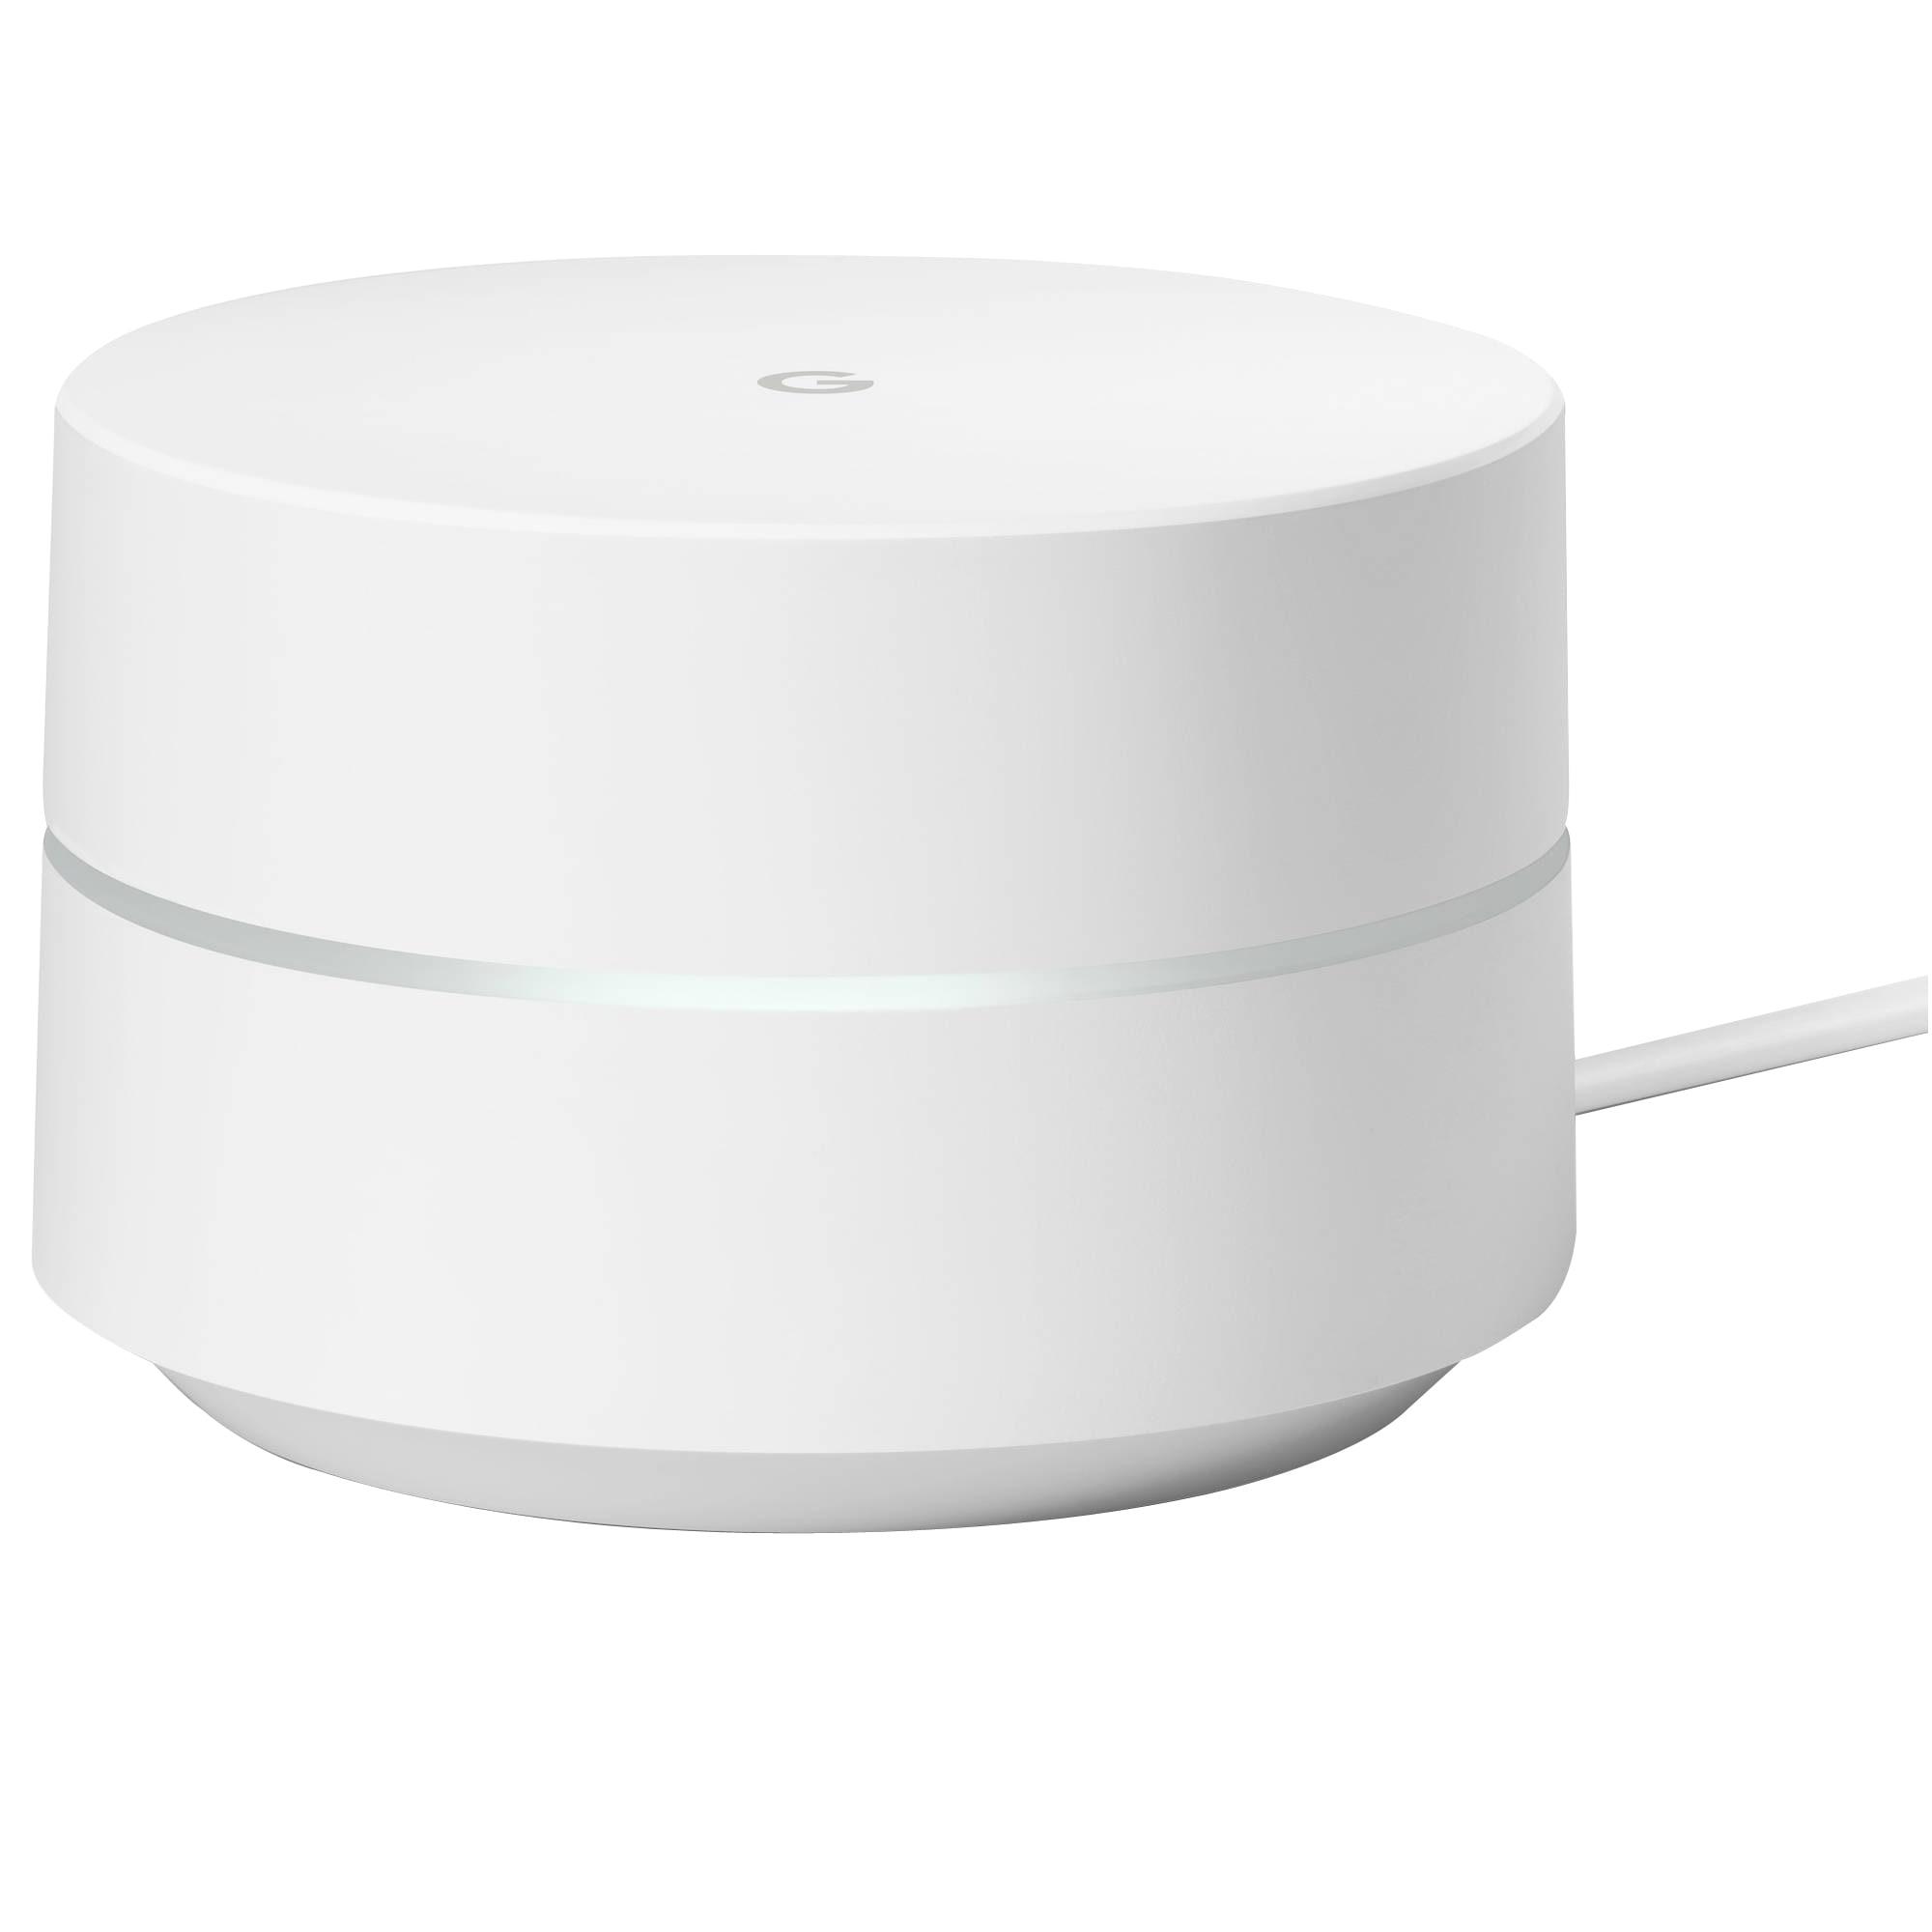 Google Wifi AC1200 Dual-Band Wi-Fi Router, White